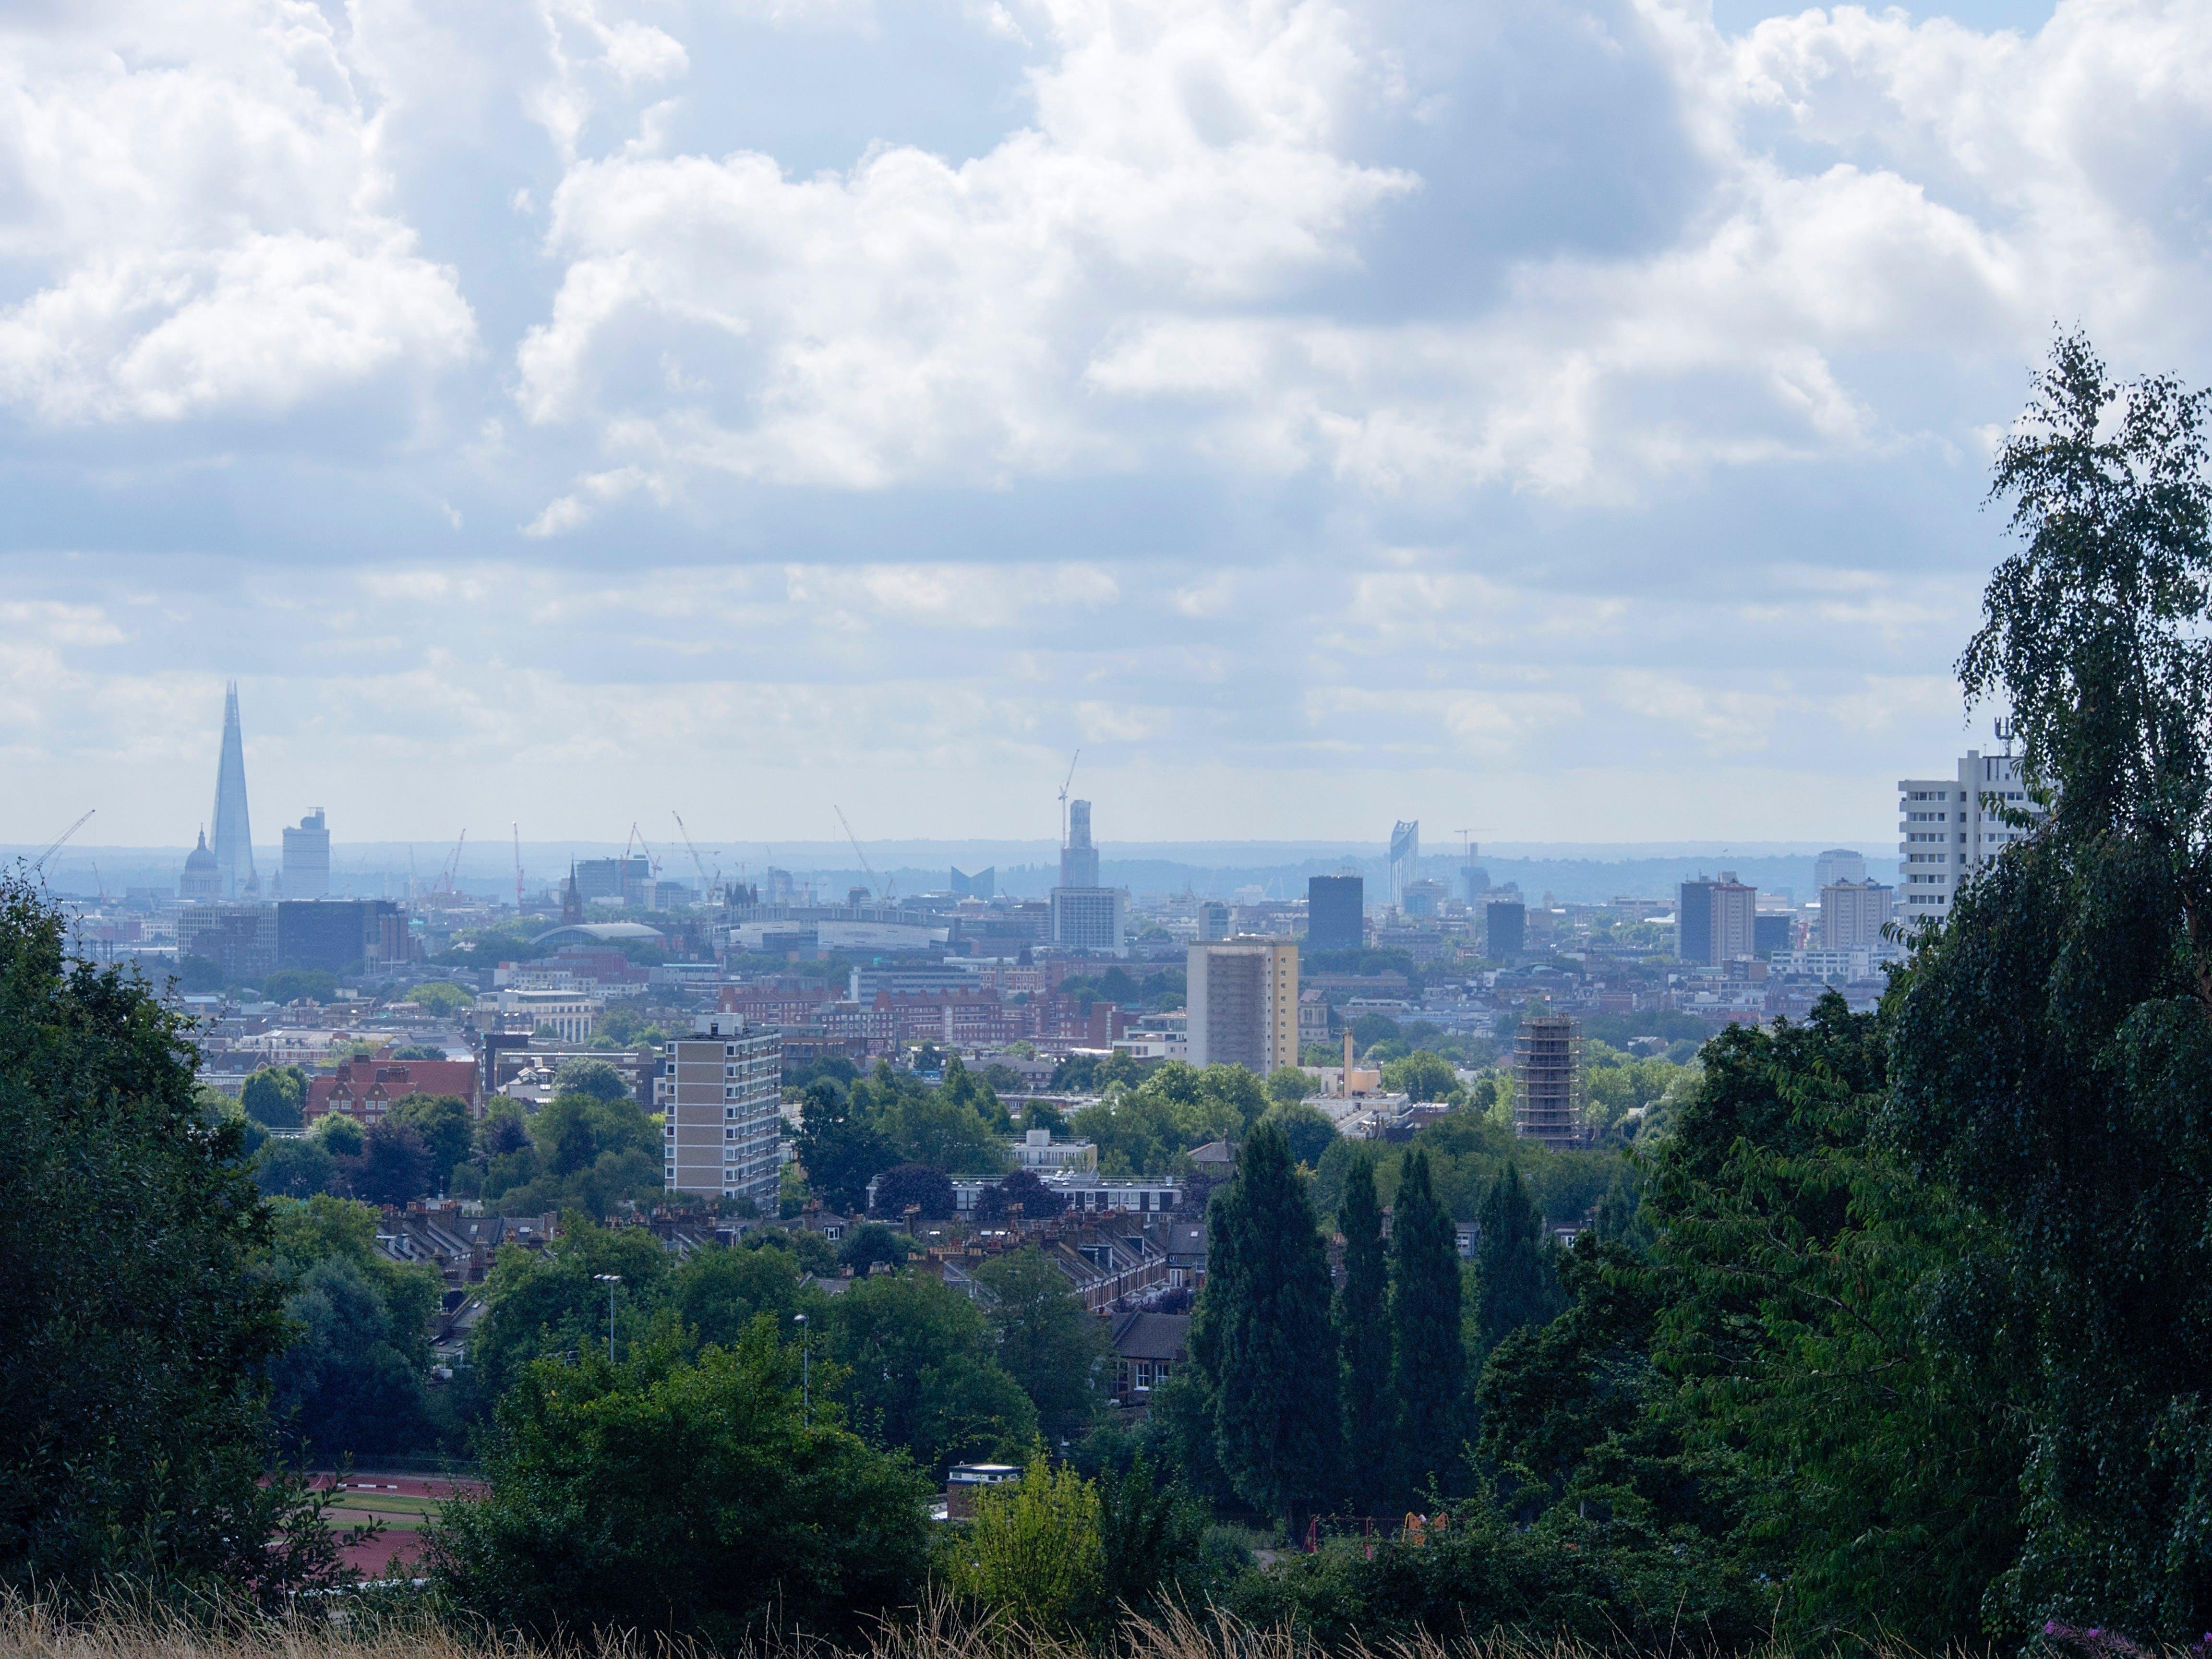 hampstead heath, london, parliament hill view